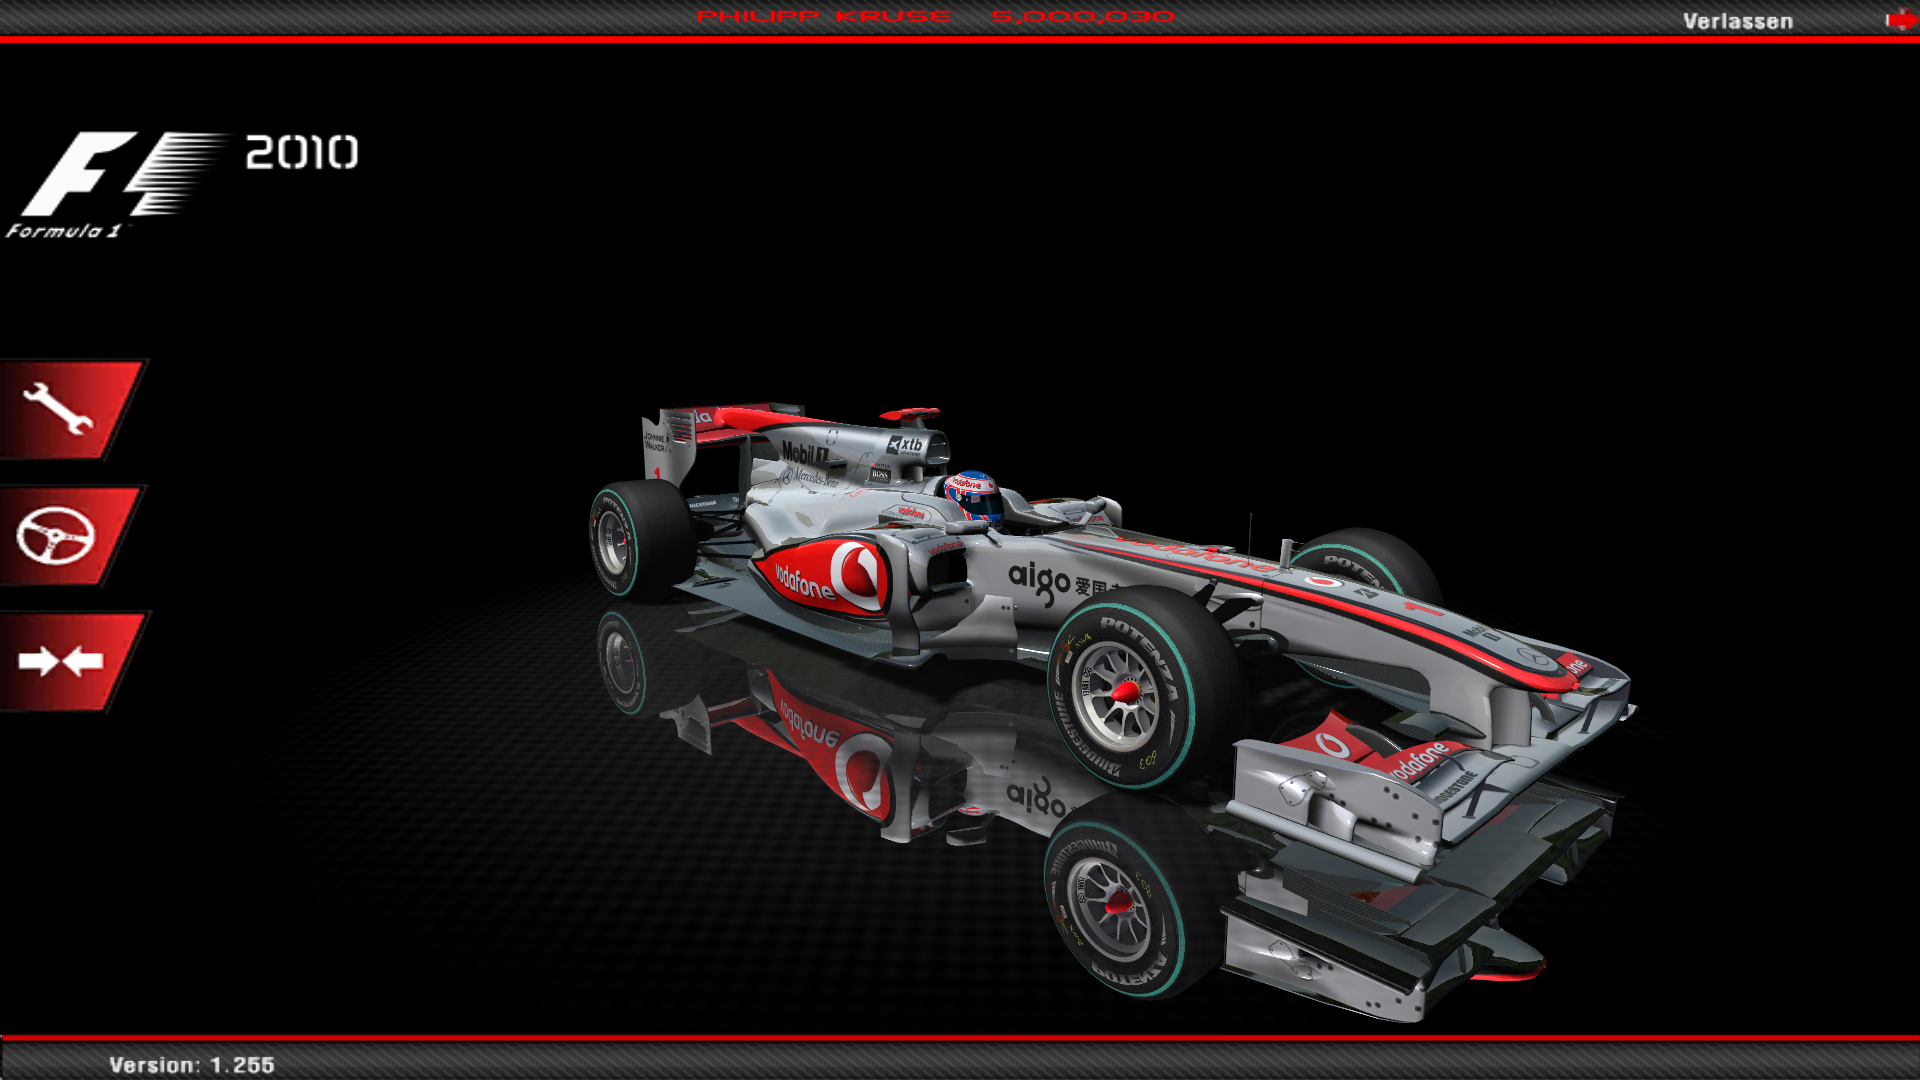 F1 2010 LE - Mod a utilizar en el server. 01_mclaren_shaderrhso